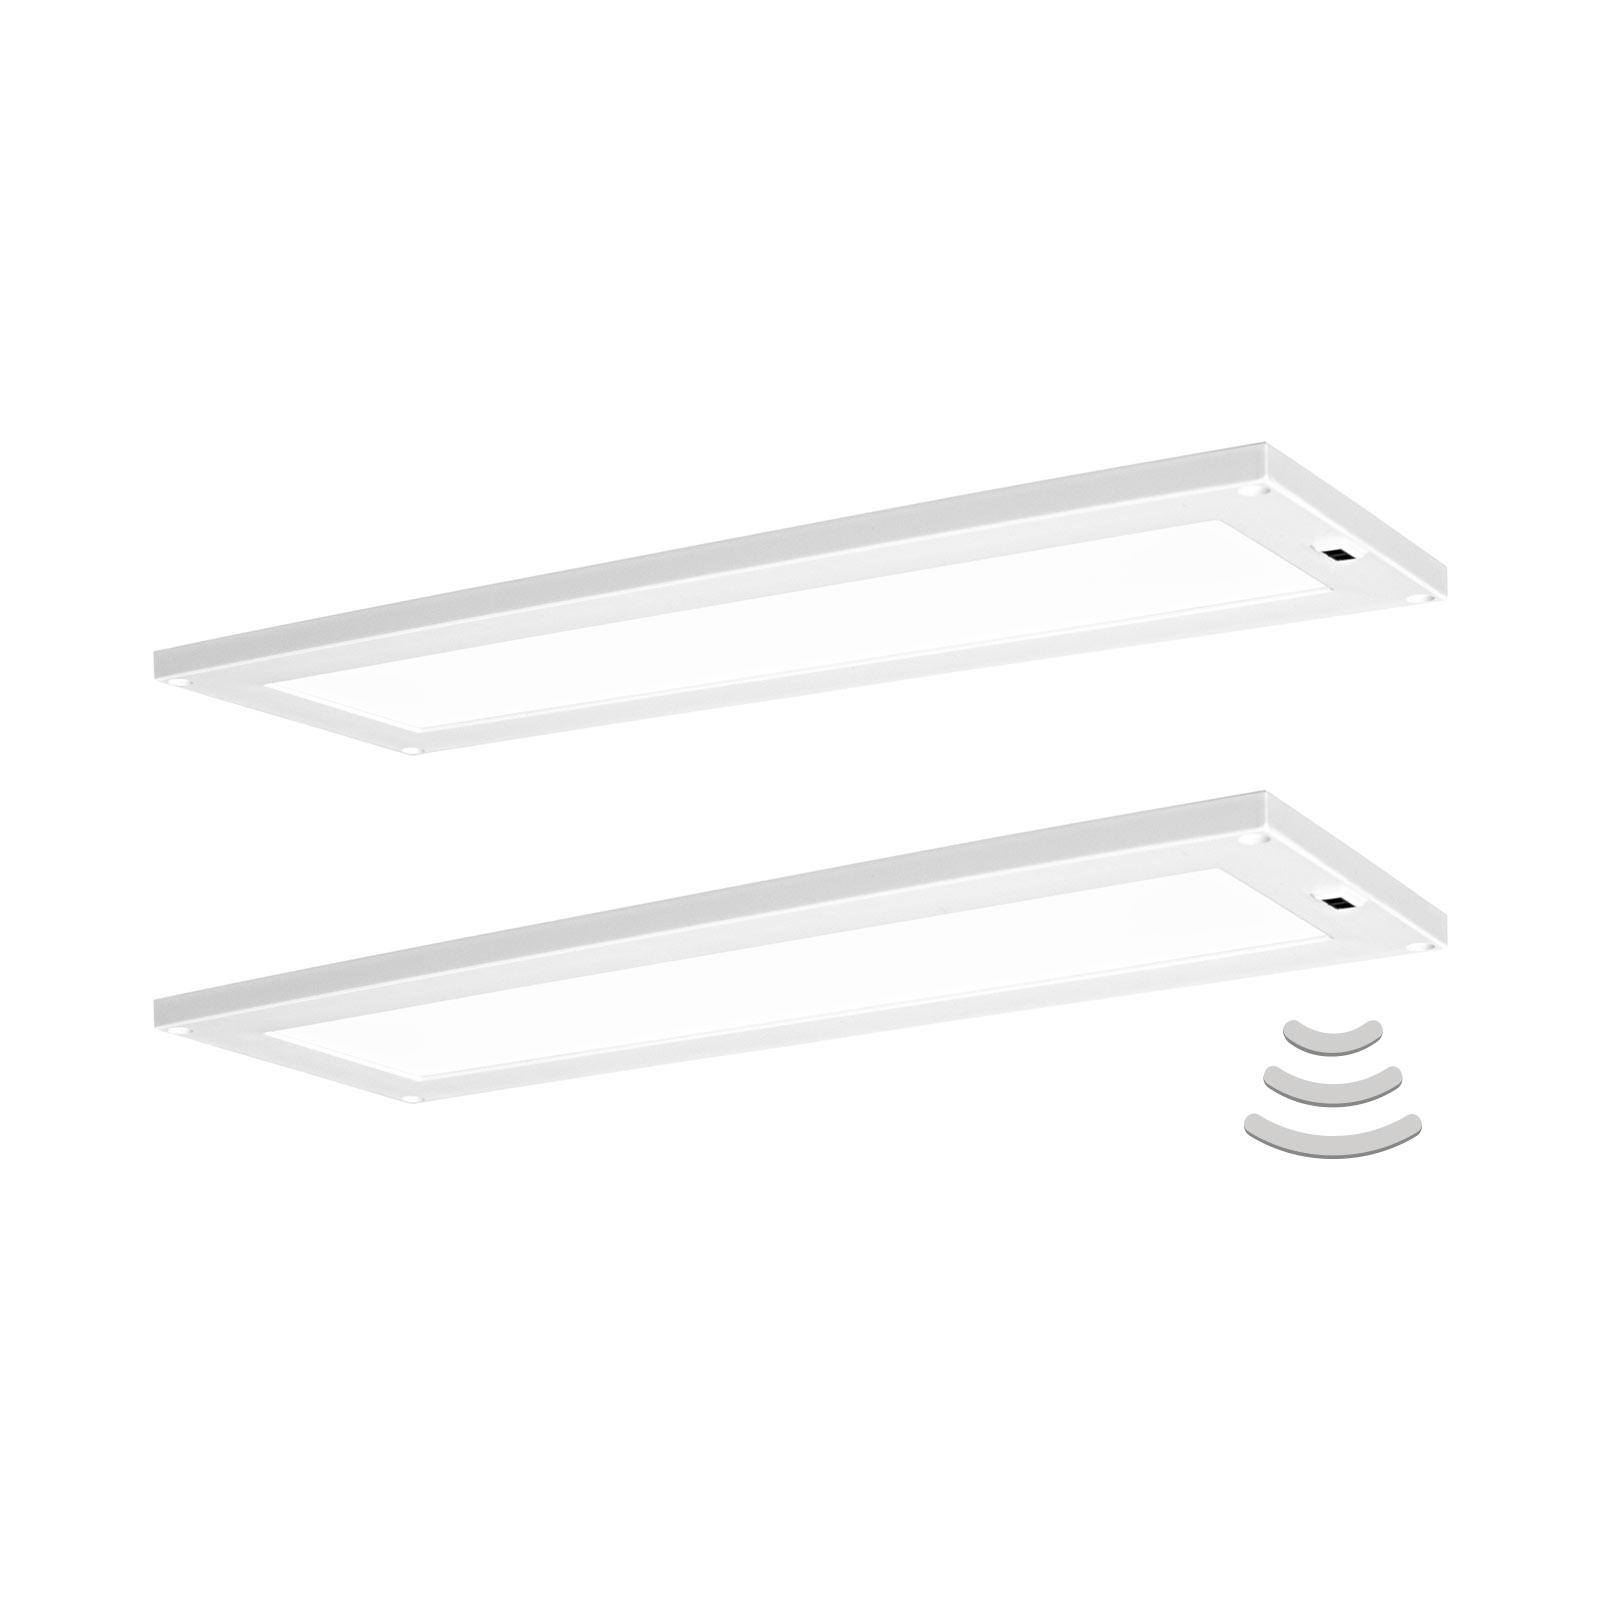 LEDVANCE Cabinet Panel benkarmatur 30x10cm 2er